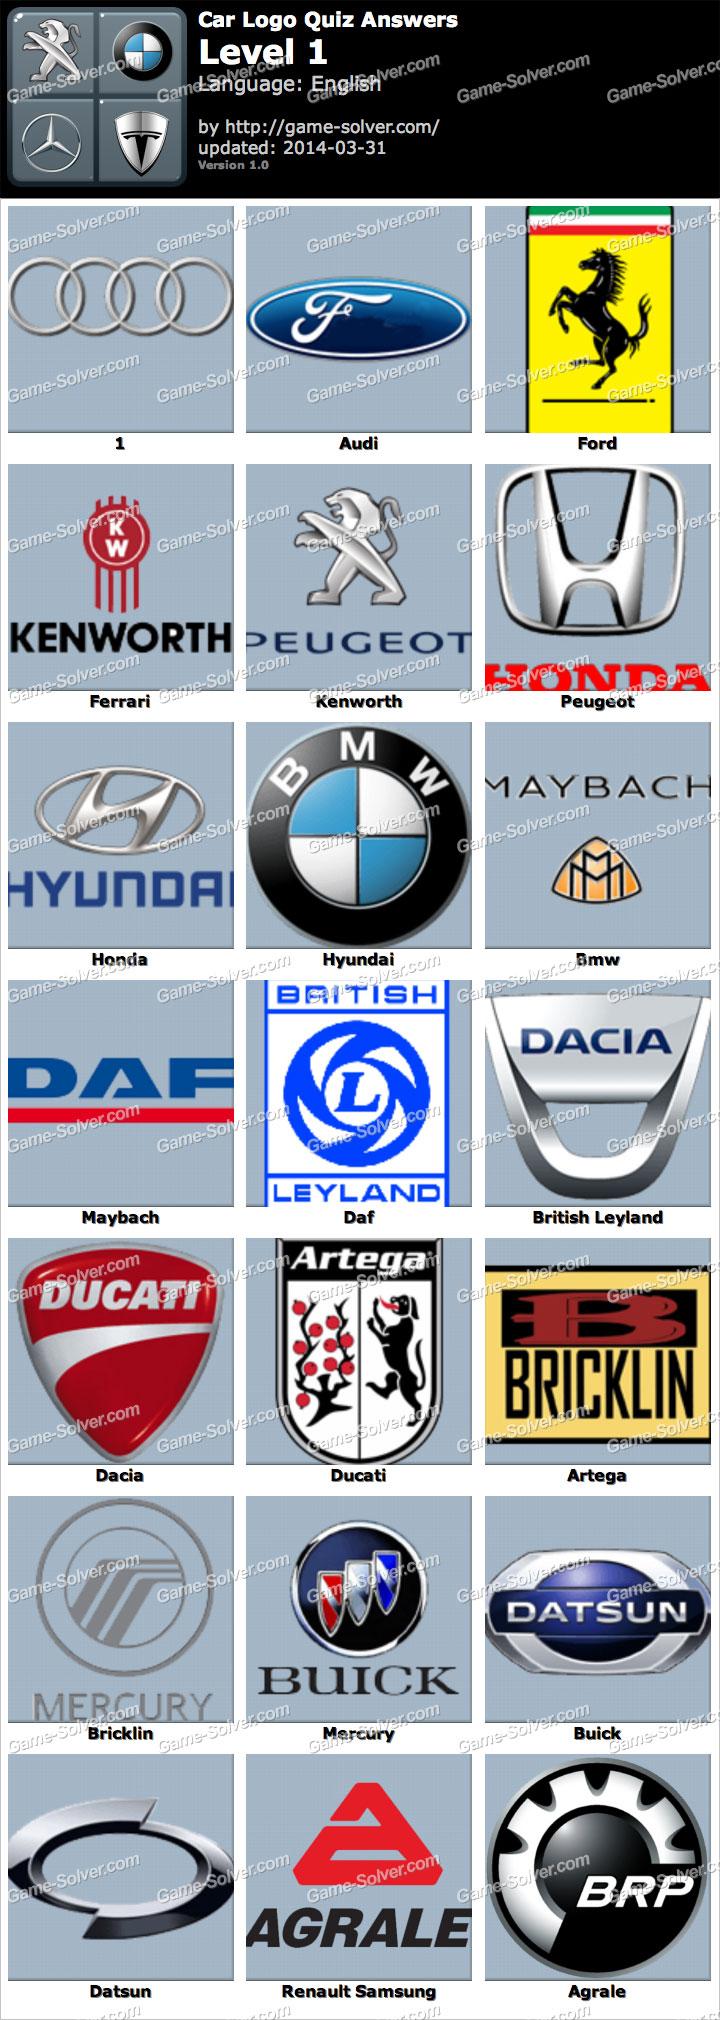 car logo quiz answers game solver